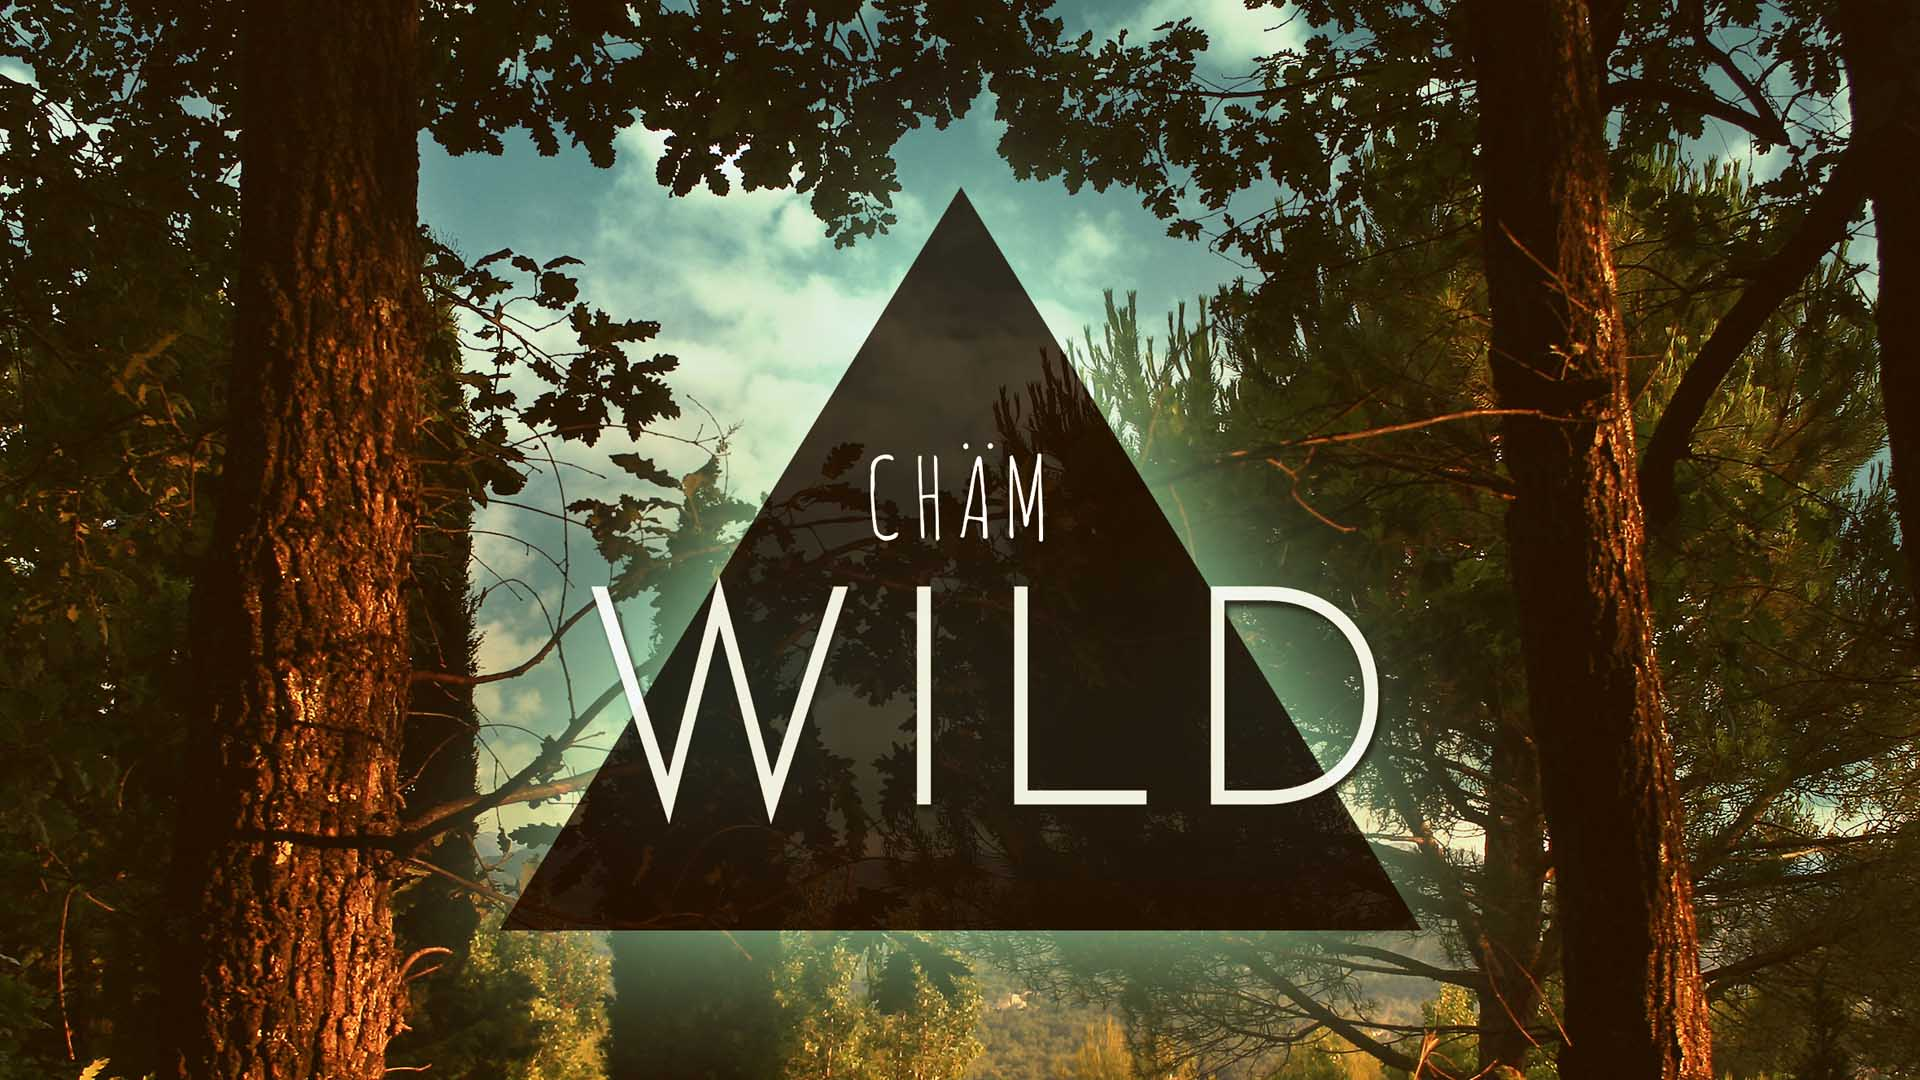 Chäm WILD - teaser